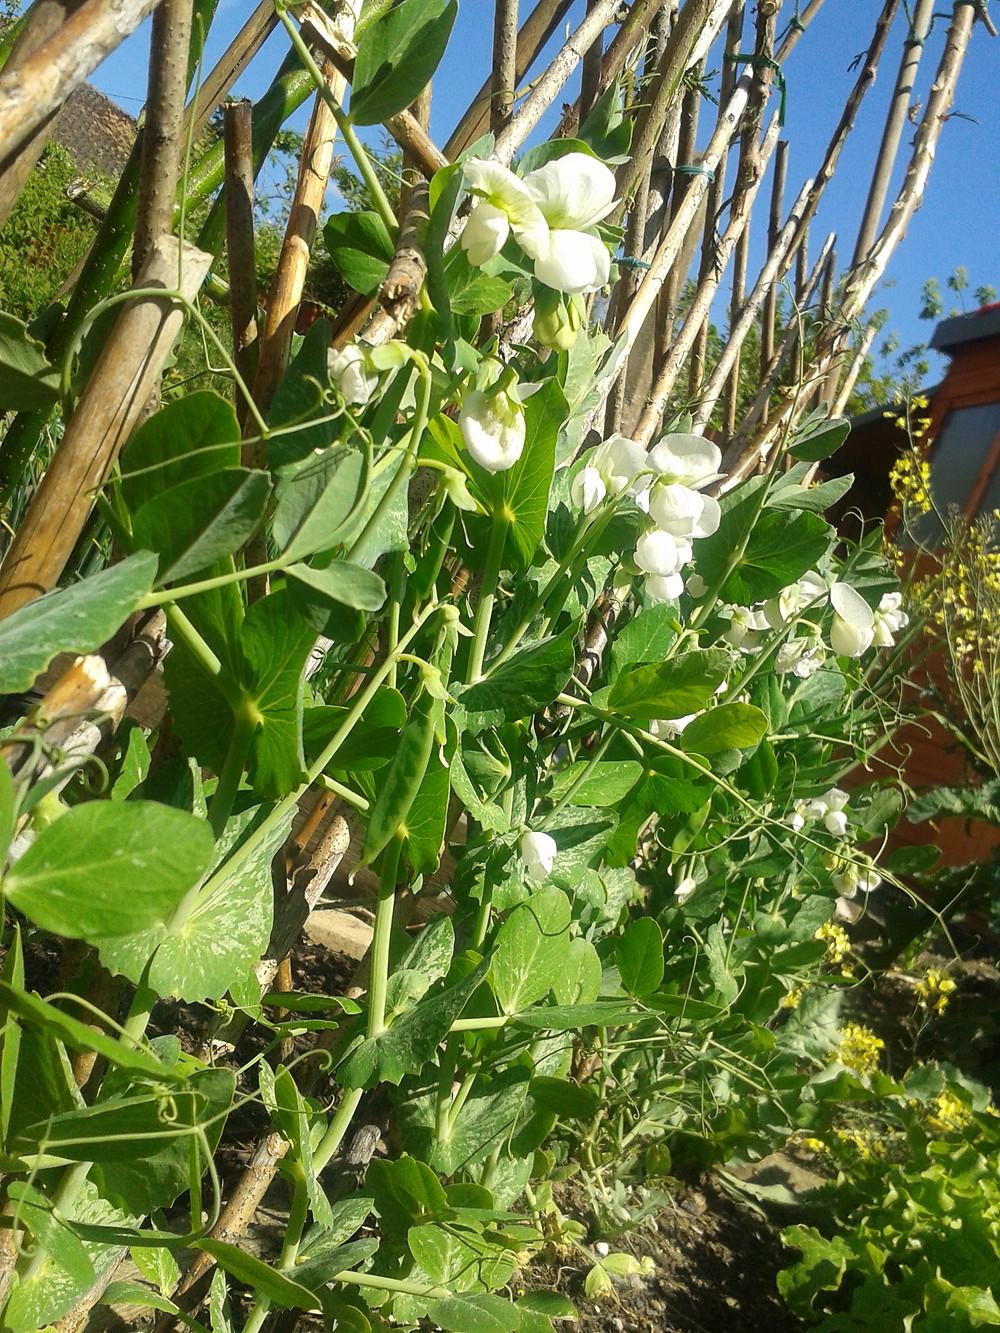 Pea shoots in flower